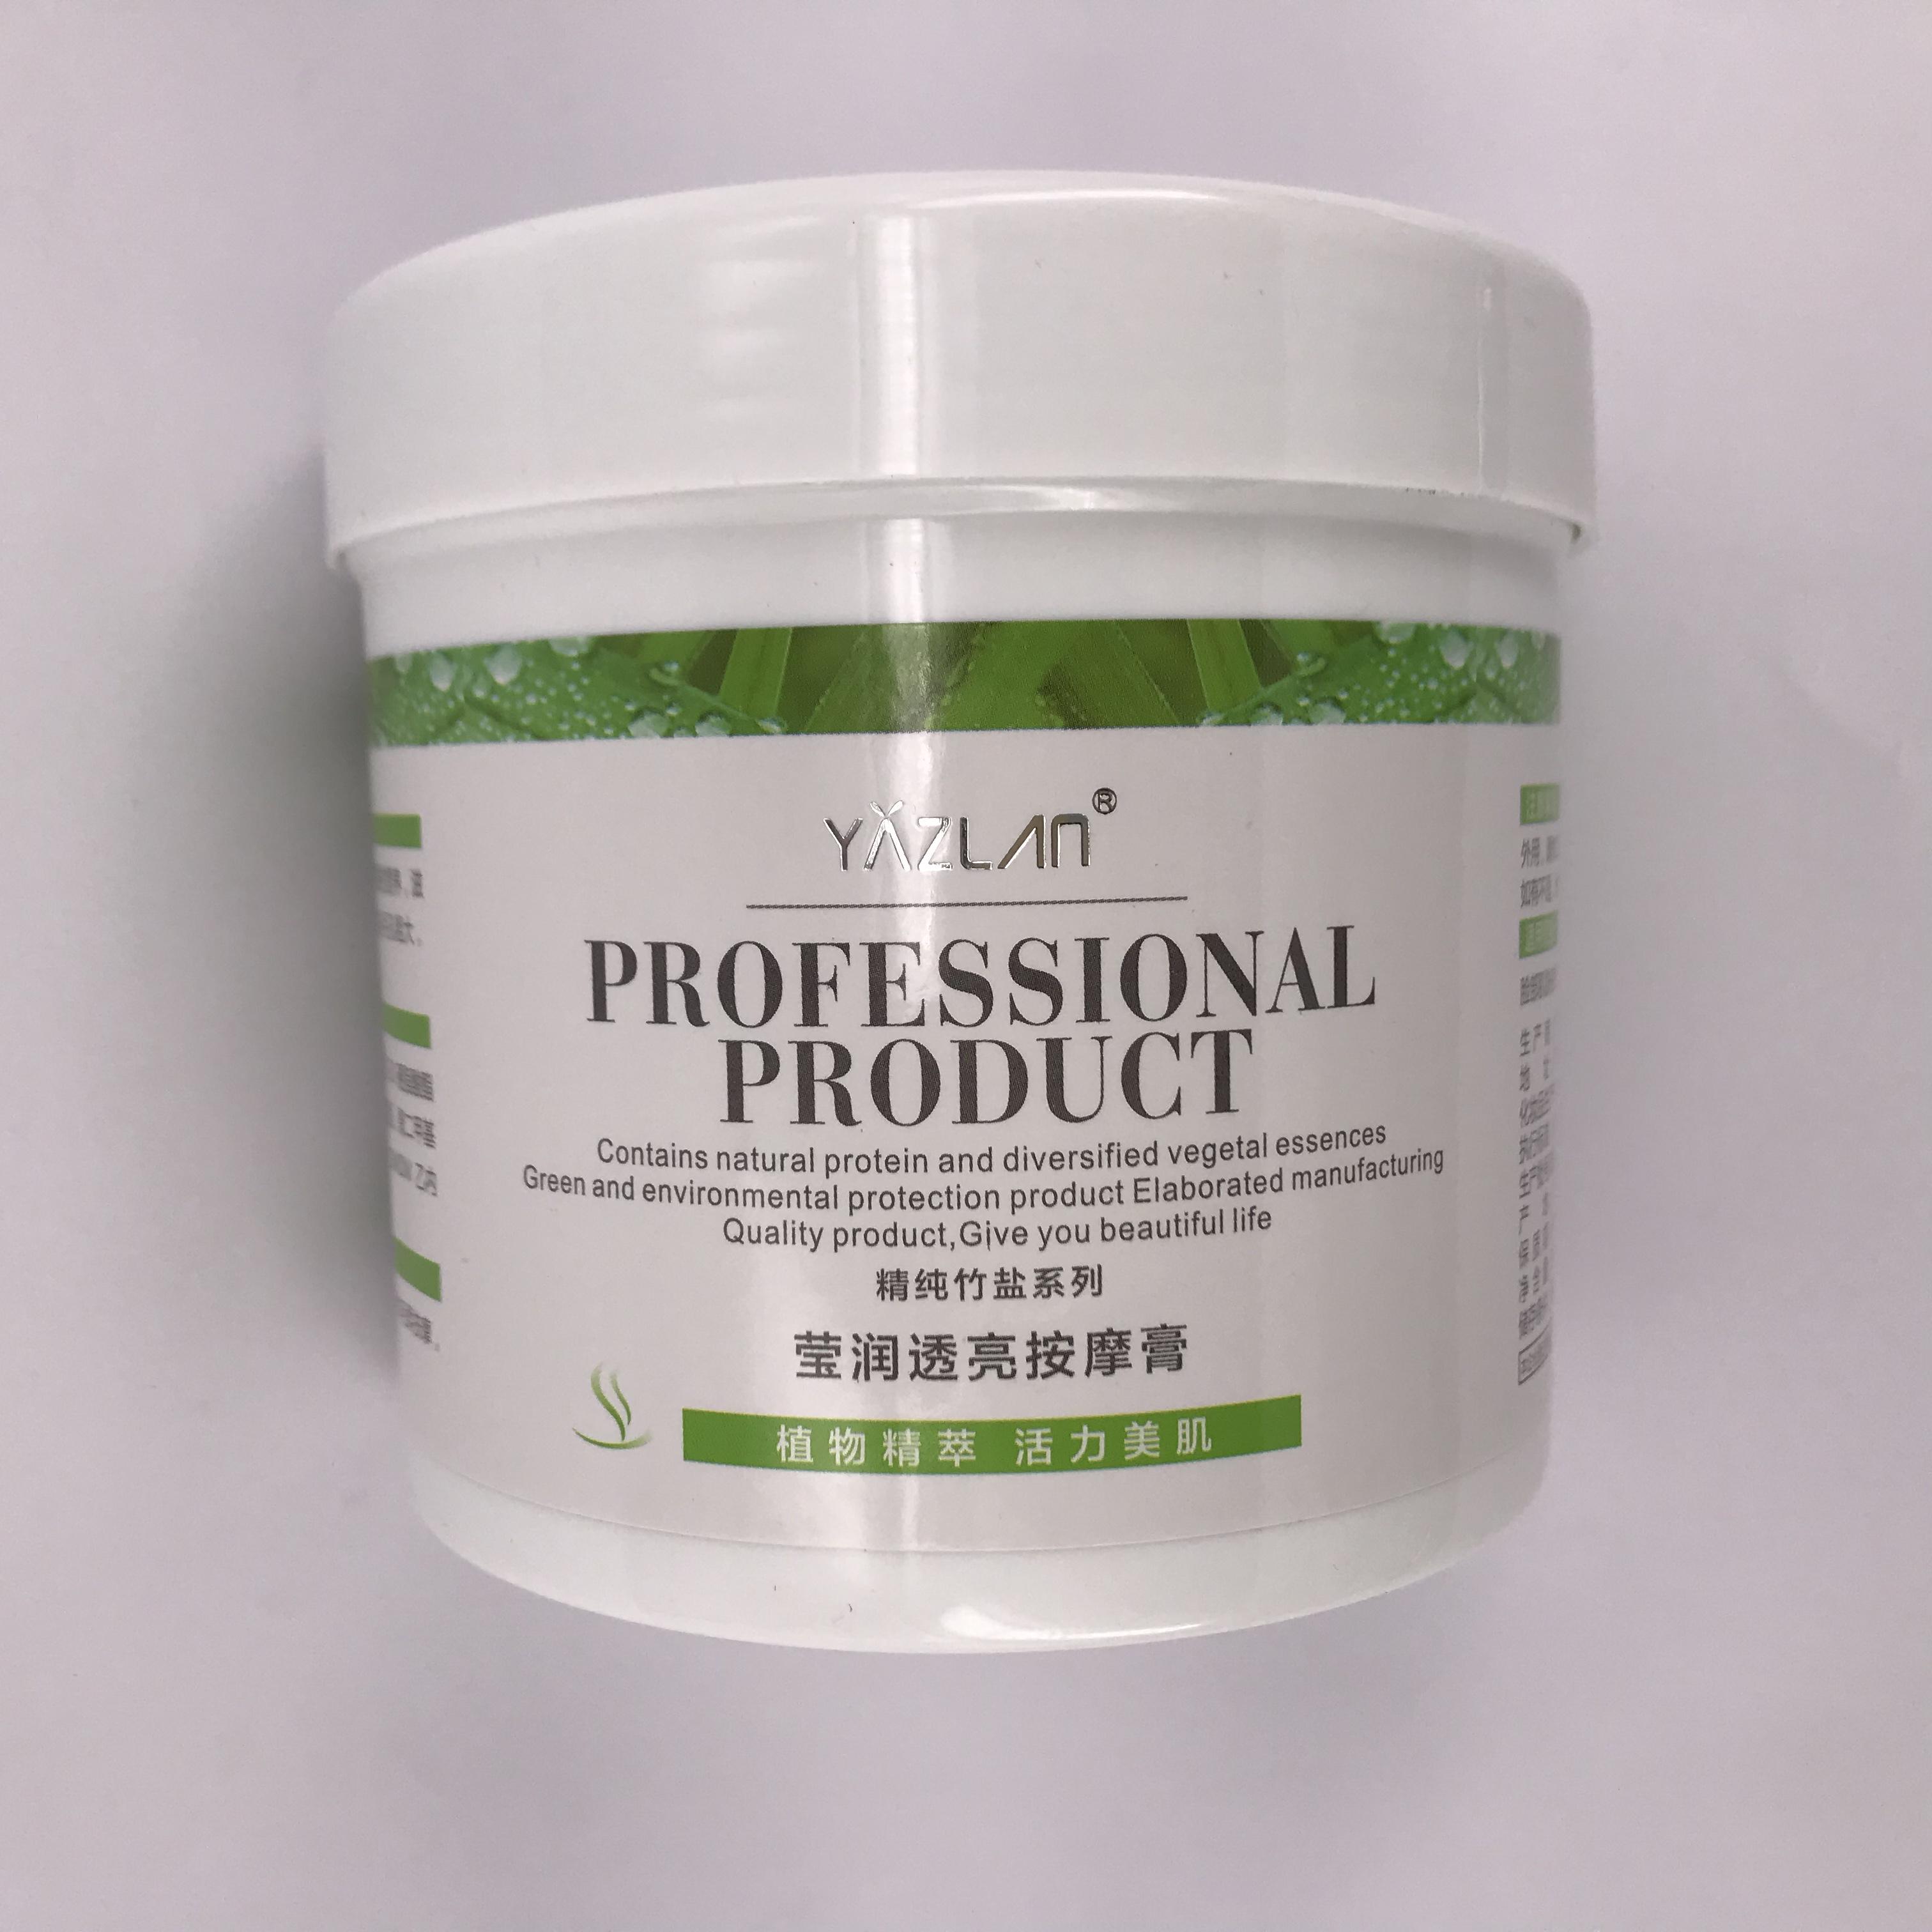 Massage cream moistening and translucent beauty salon face body scraping tongjingluo moisturizing Moisturizing Massage Cream 500g